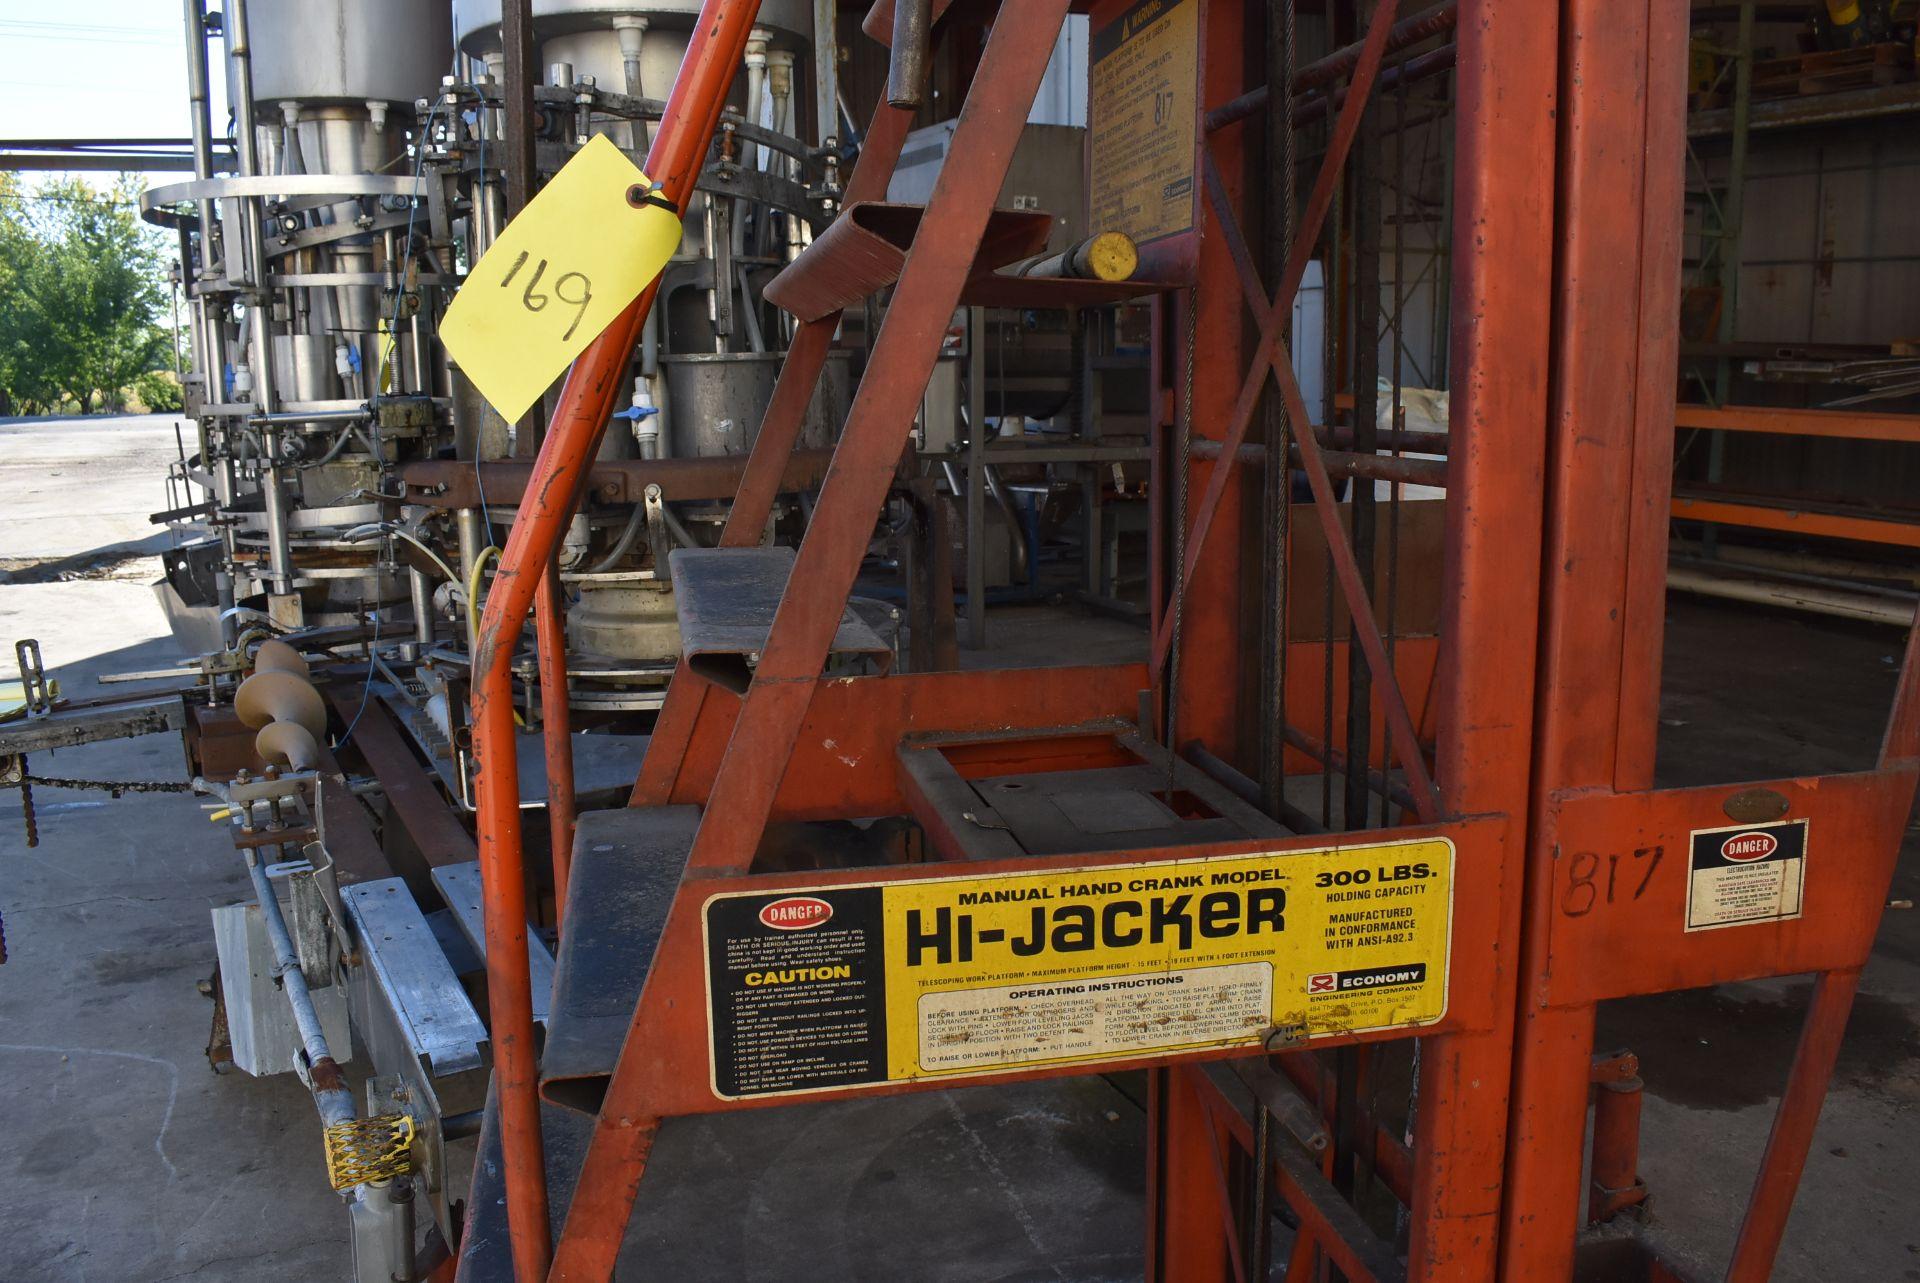 Economy Engineering Model Hi-Jacker Manual Telescoping Work Platform, Max Lift 15' Ht. - Image 2 of 3